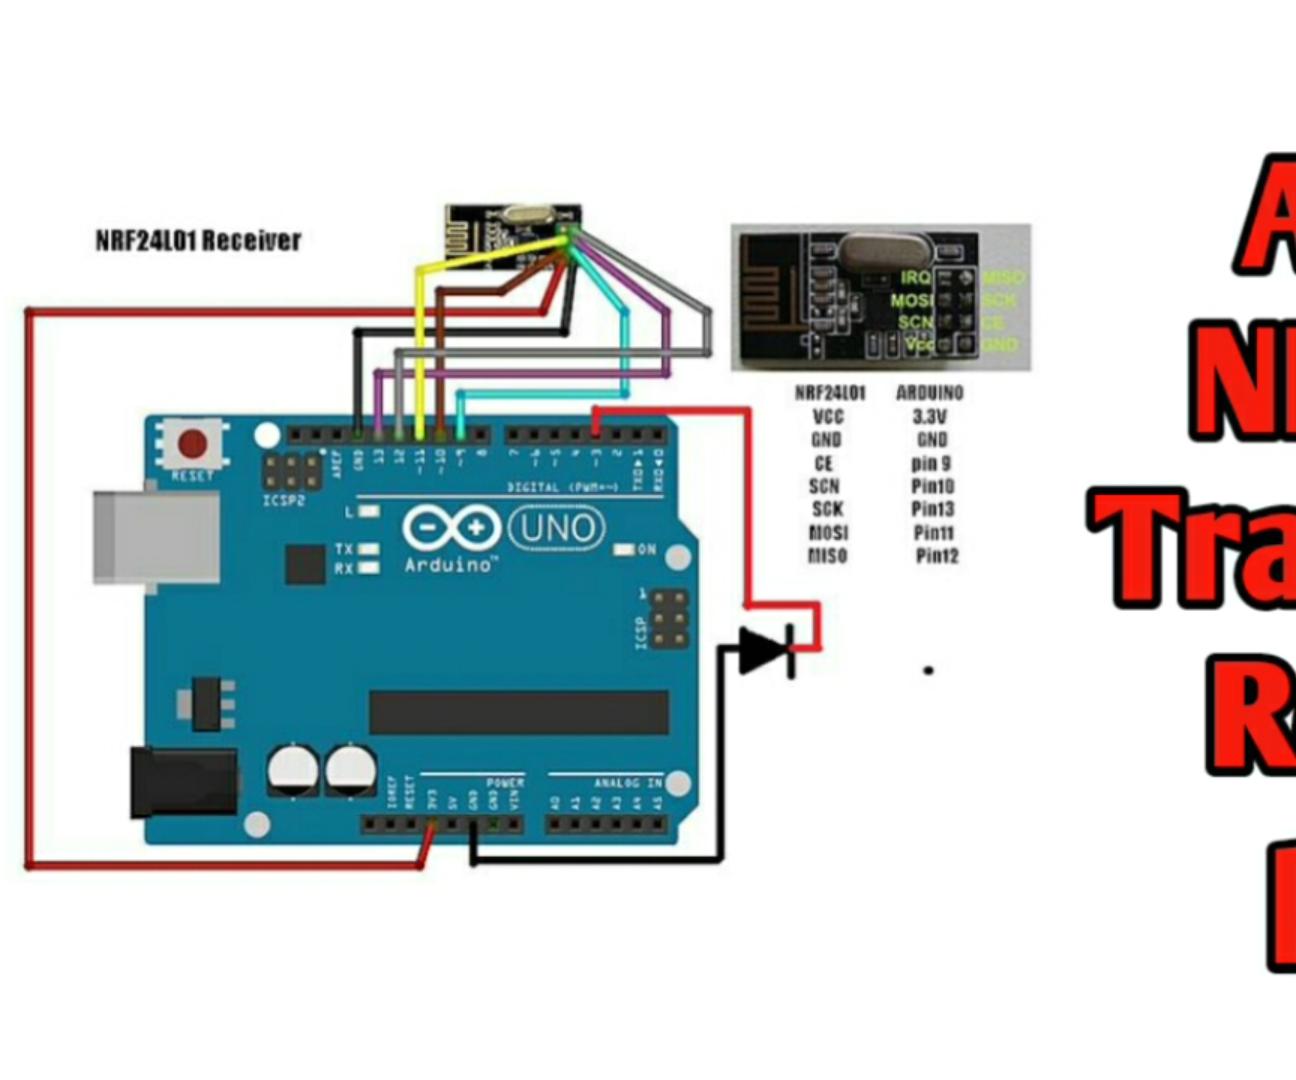 Wireless Remote Using 2.4Ghz NRF24L01 Module With Arduino | Nrf24l01 ...